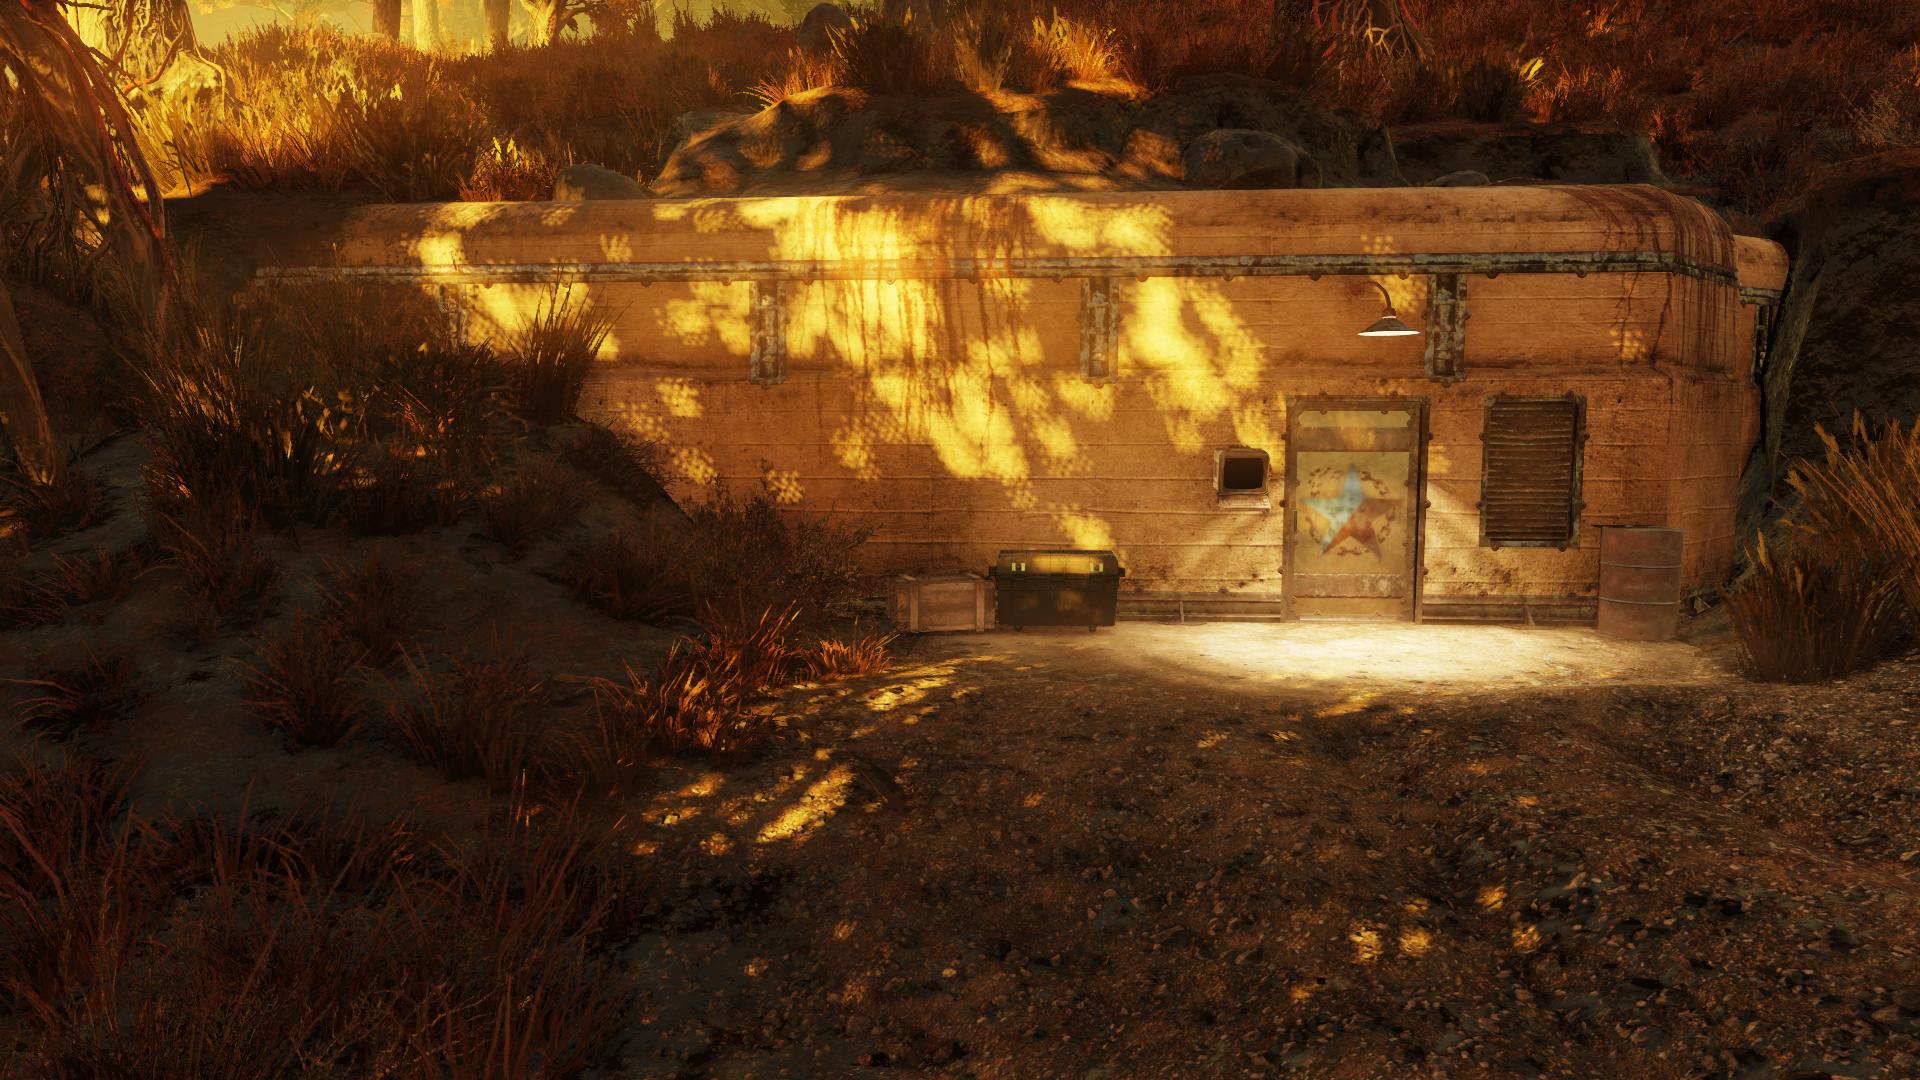 Abbie's bunker